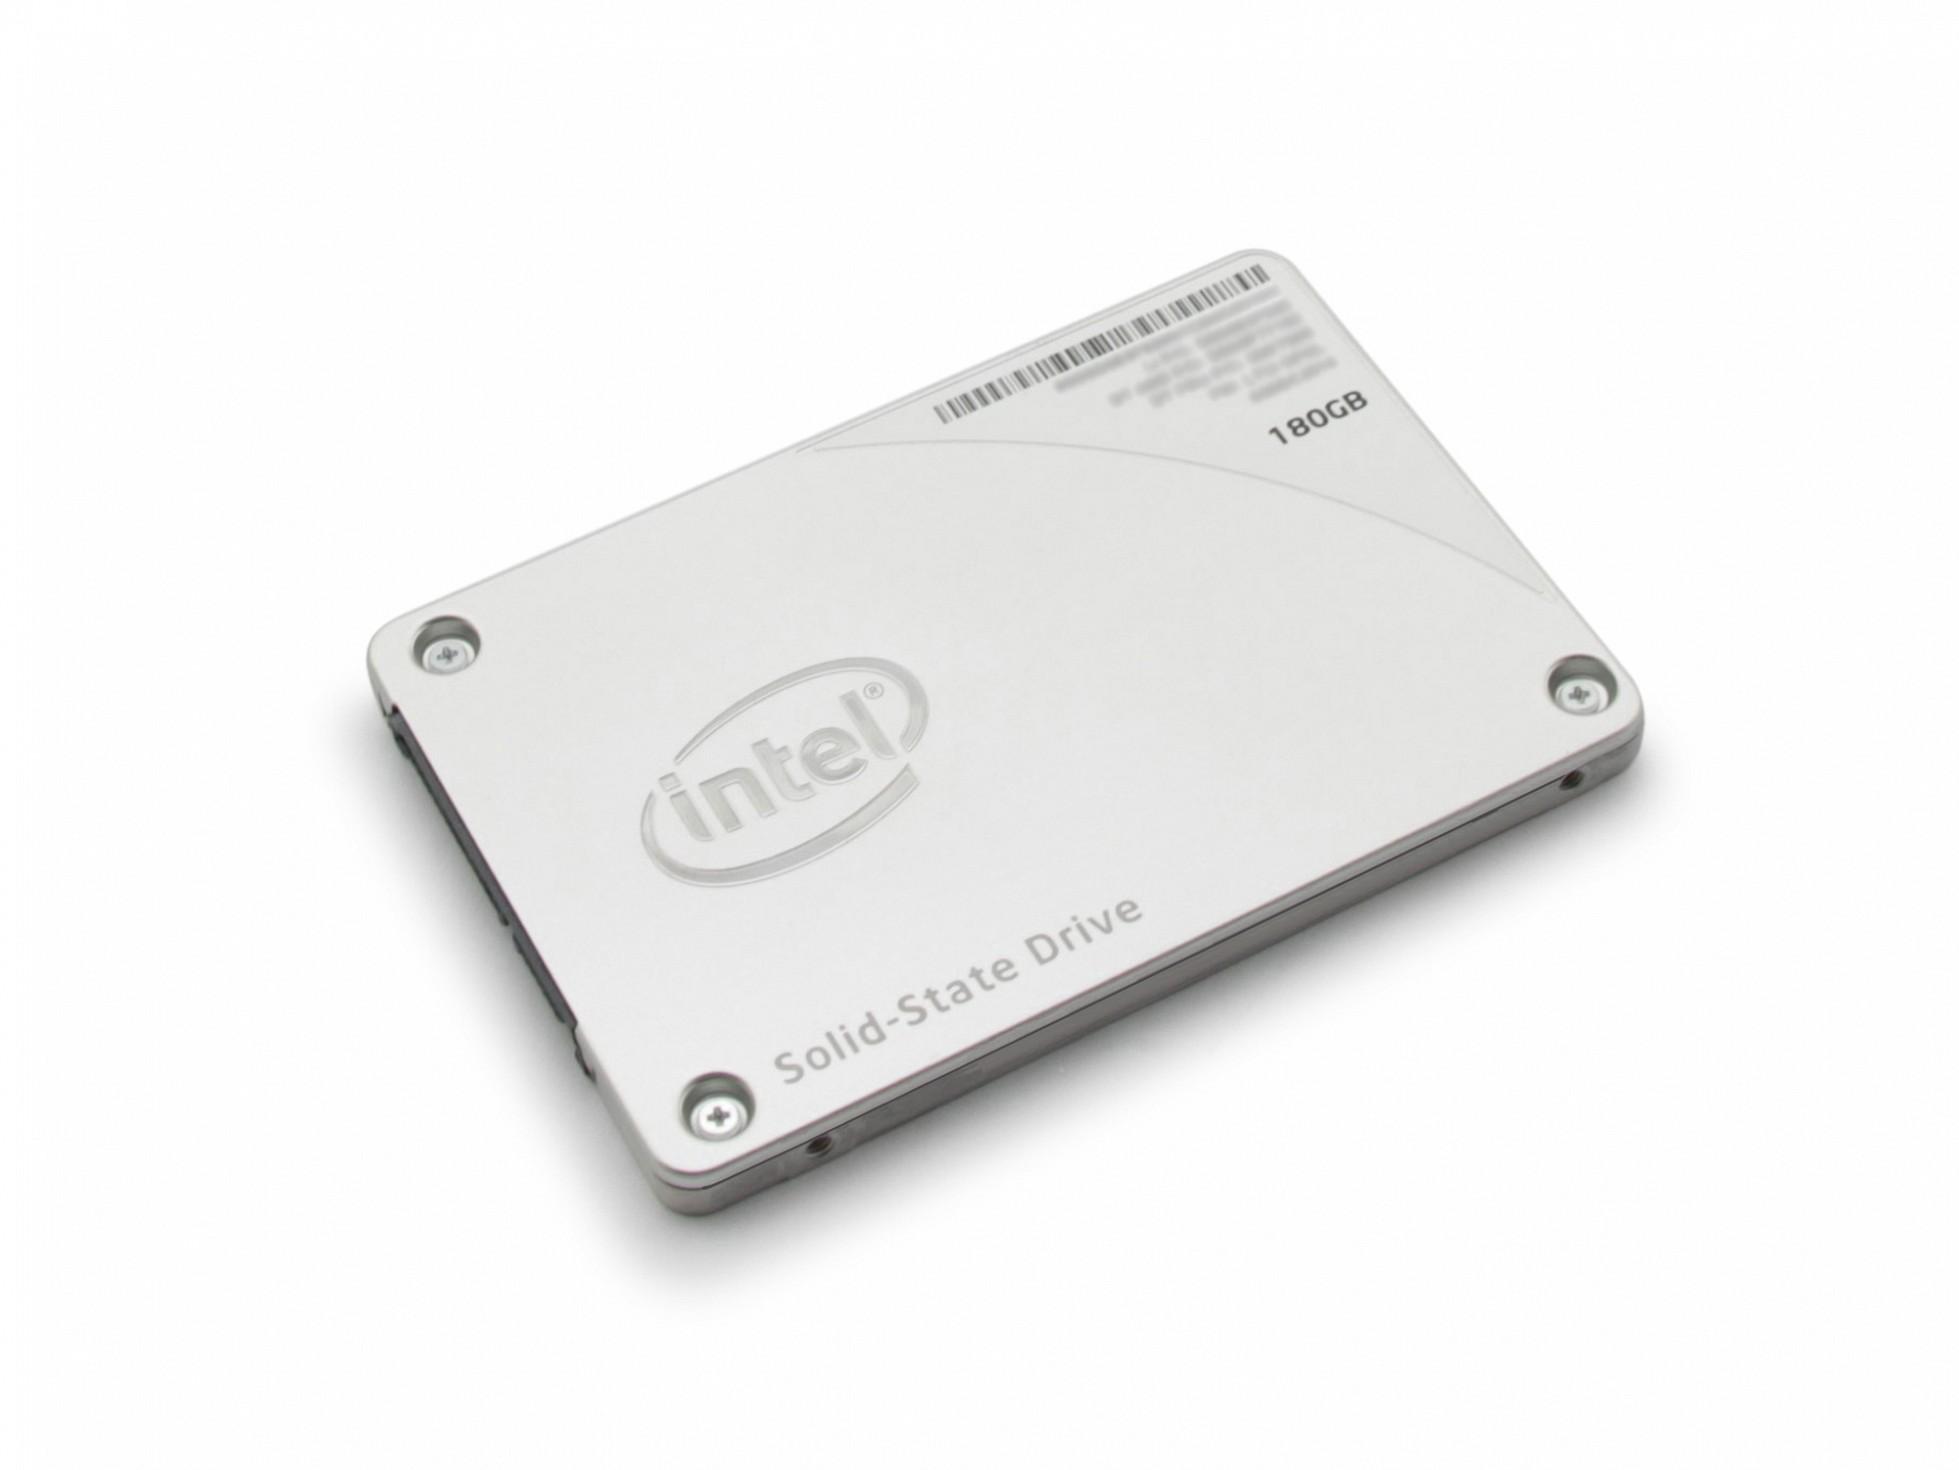 Festplatte SSD - 180GB Intel für Wortmann Terra Mobile 1509 Serie